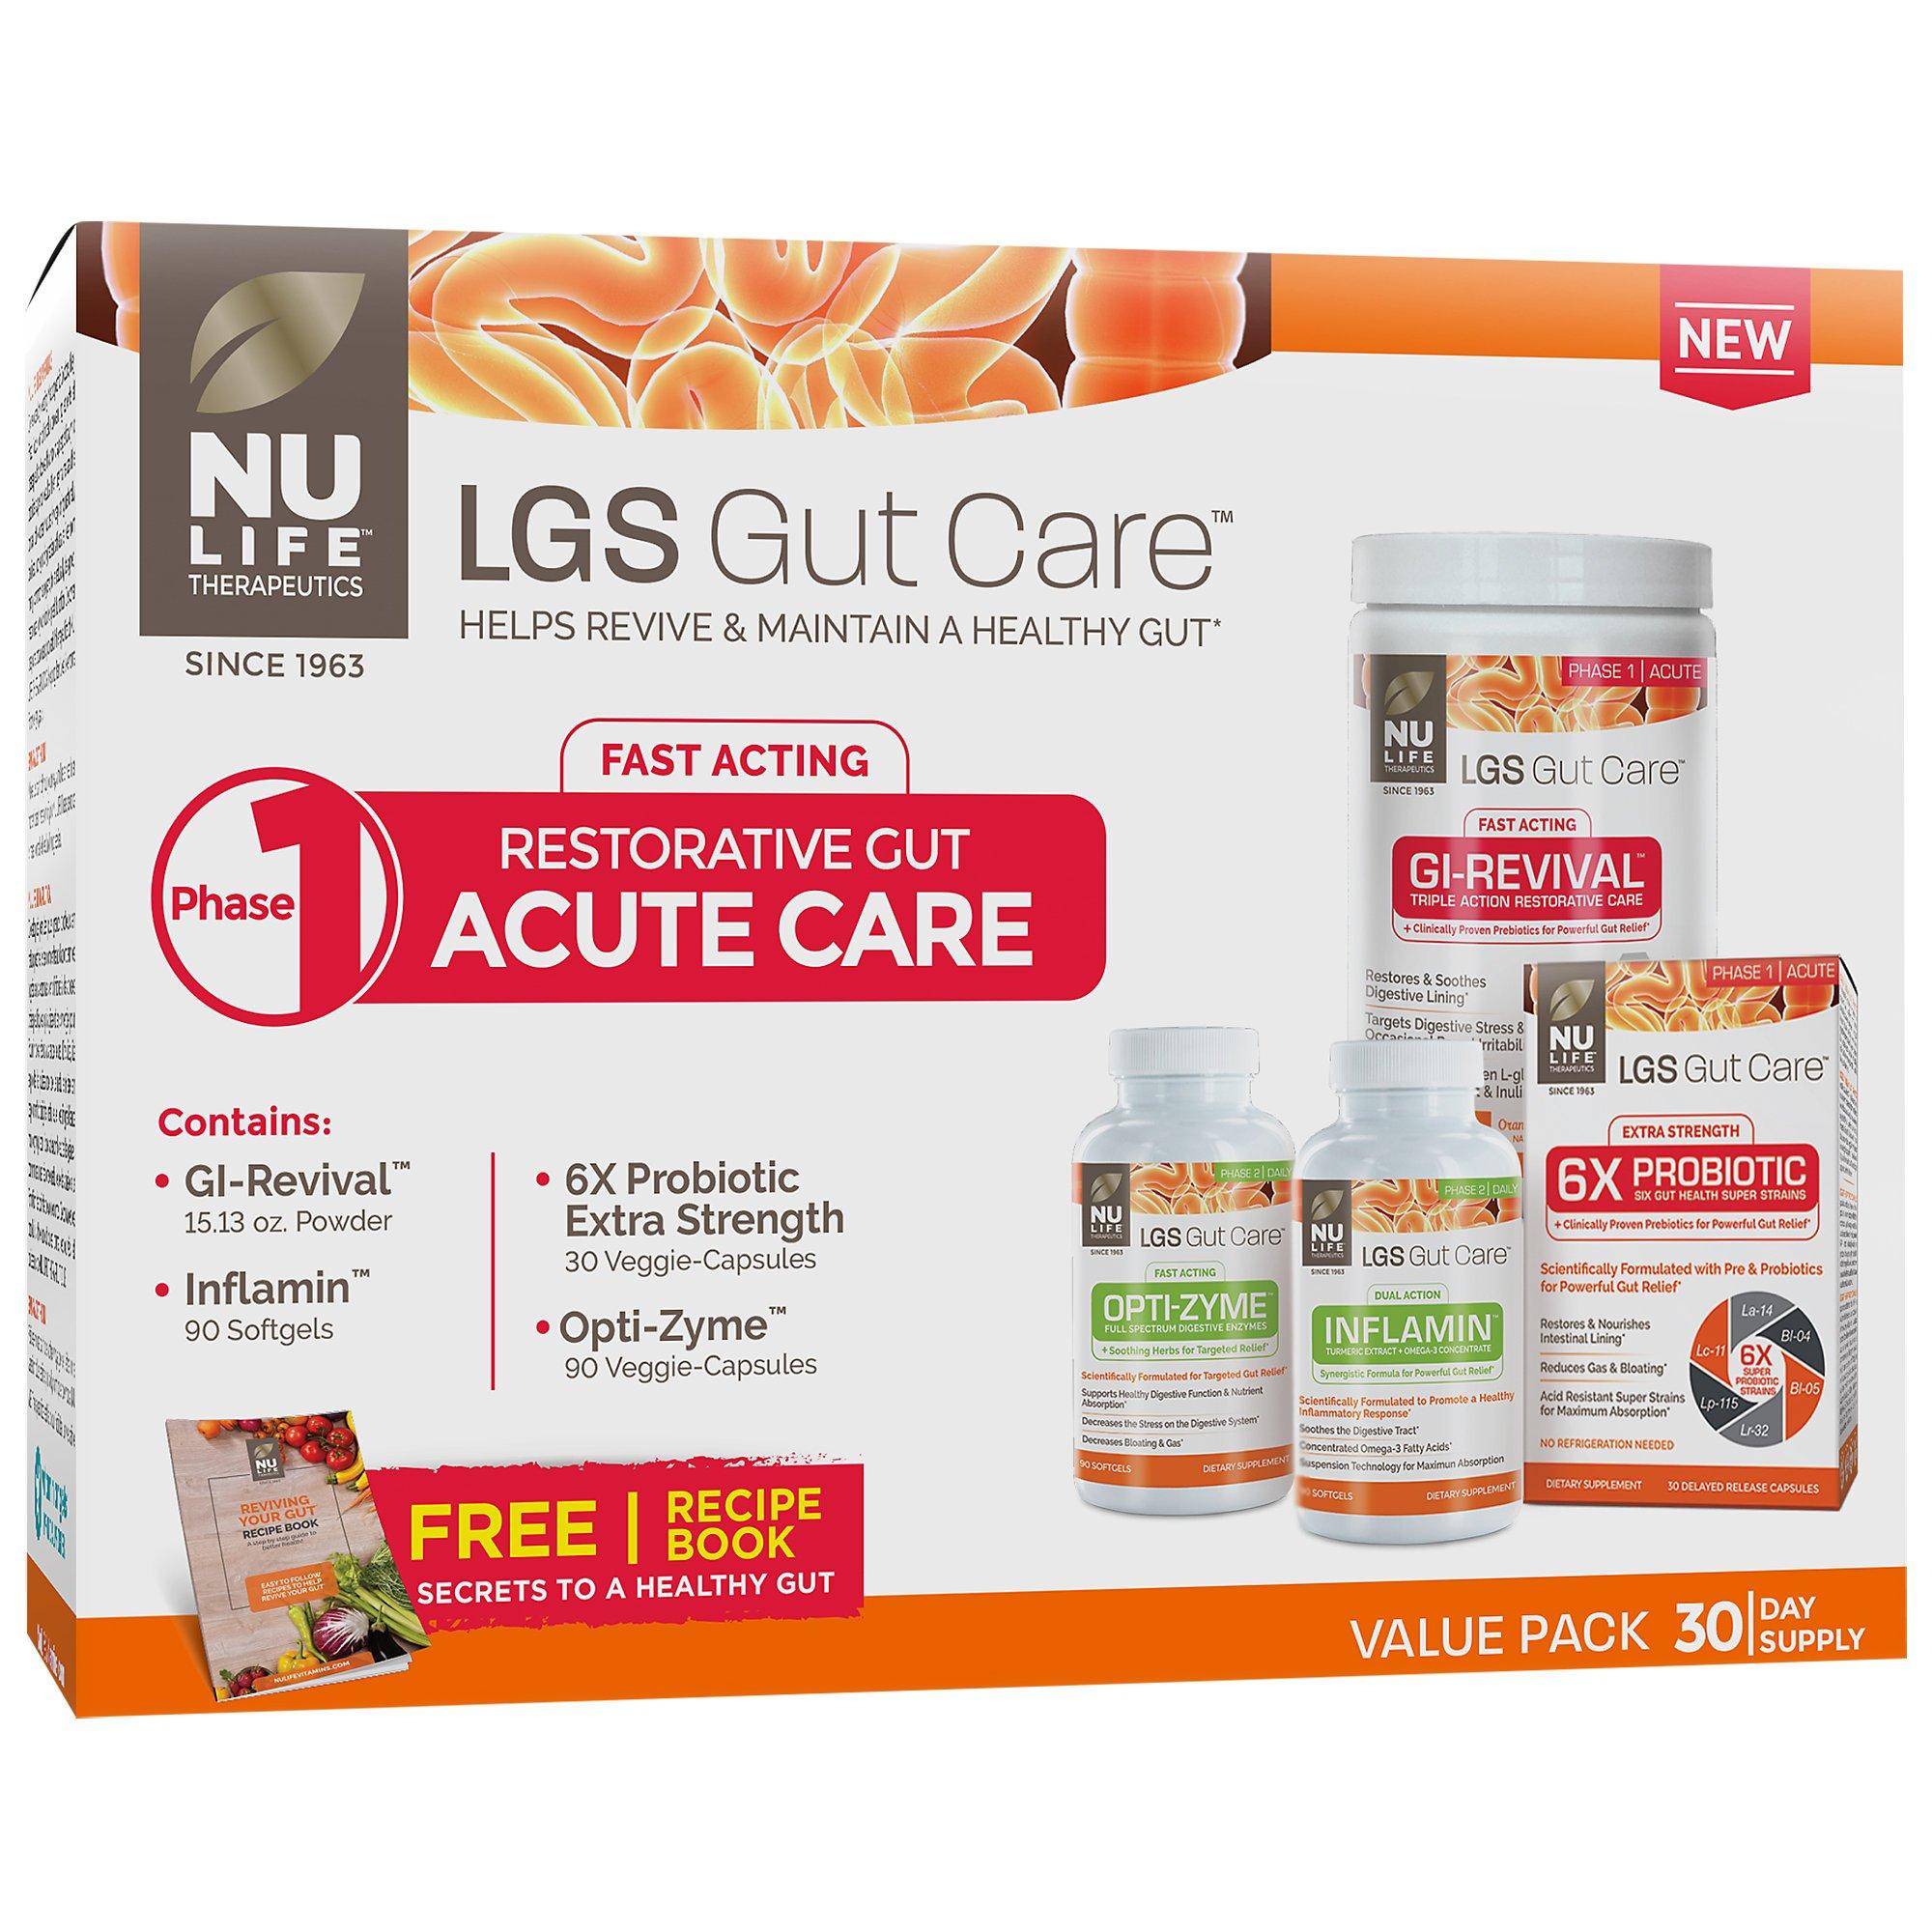 Nu Life LGS Gut Care Acute Care Kit (1 Kit)